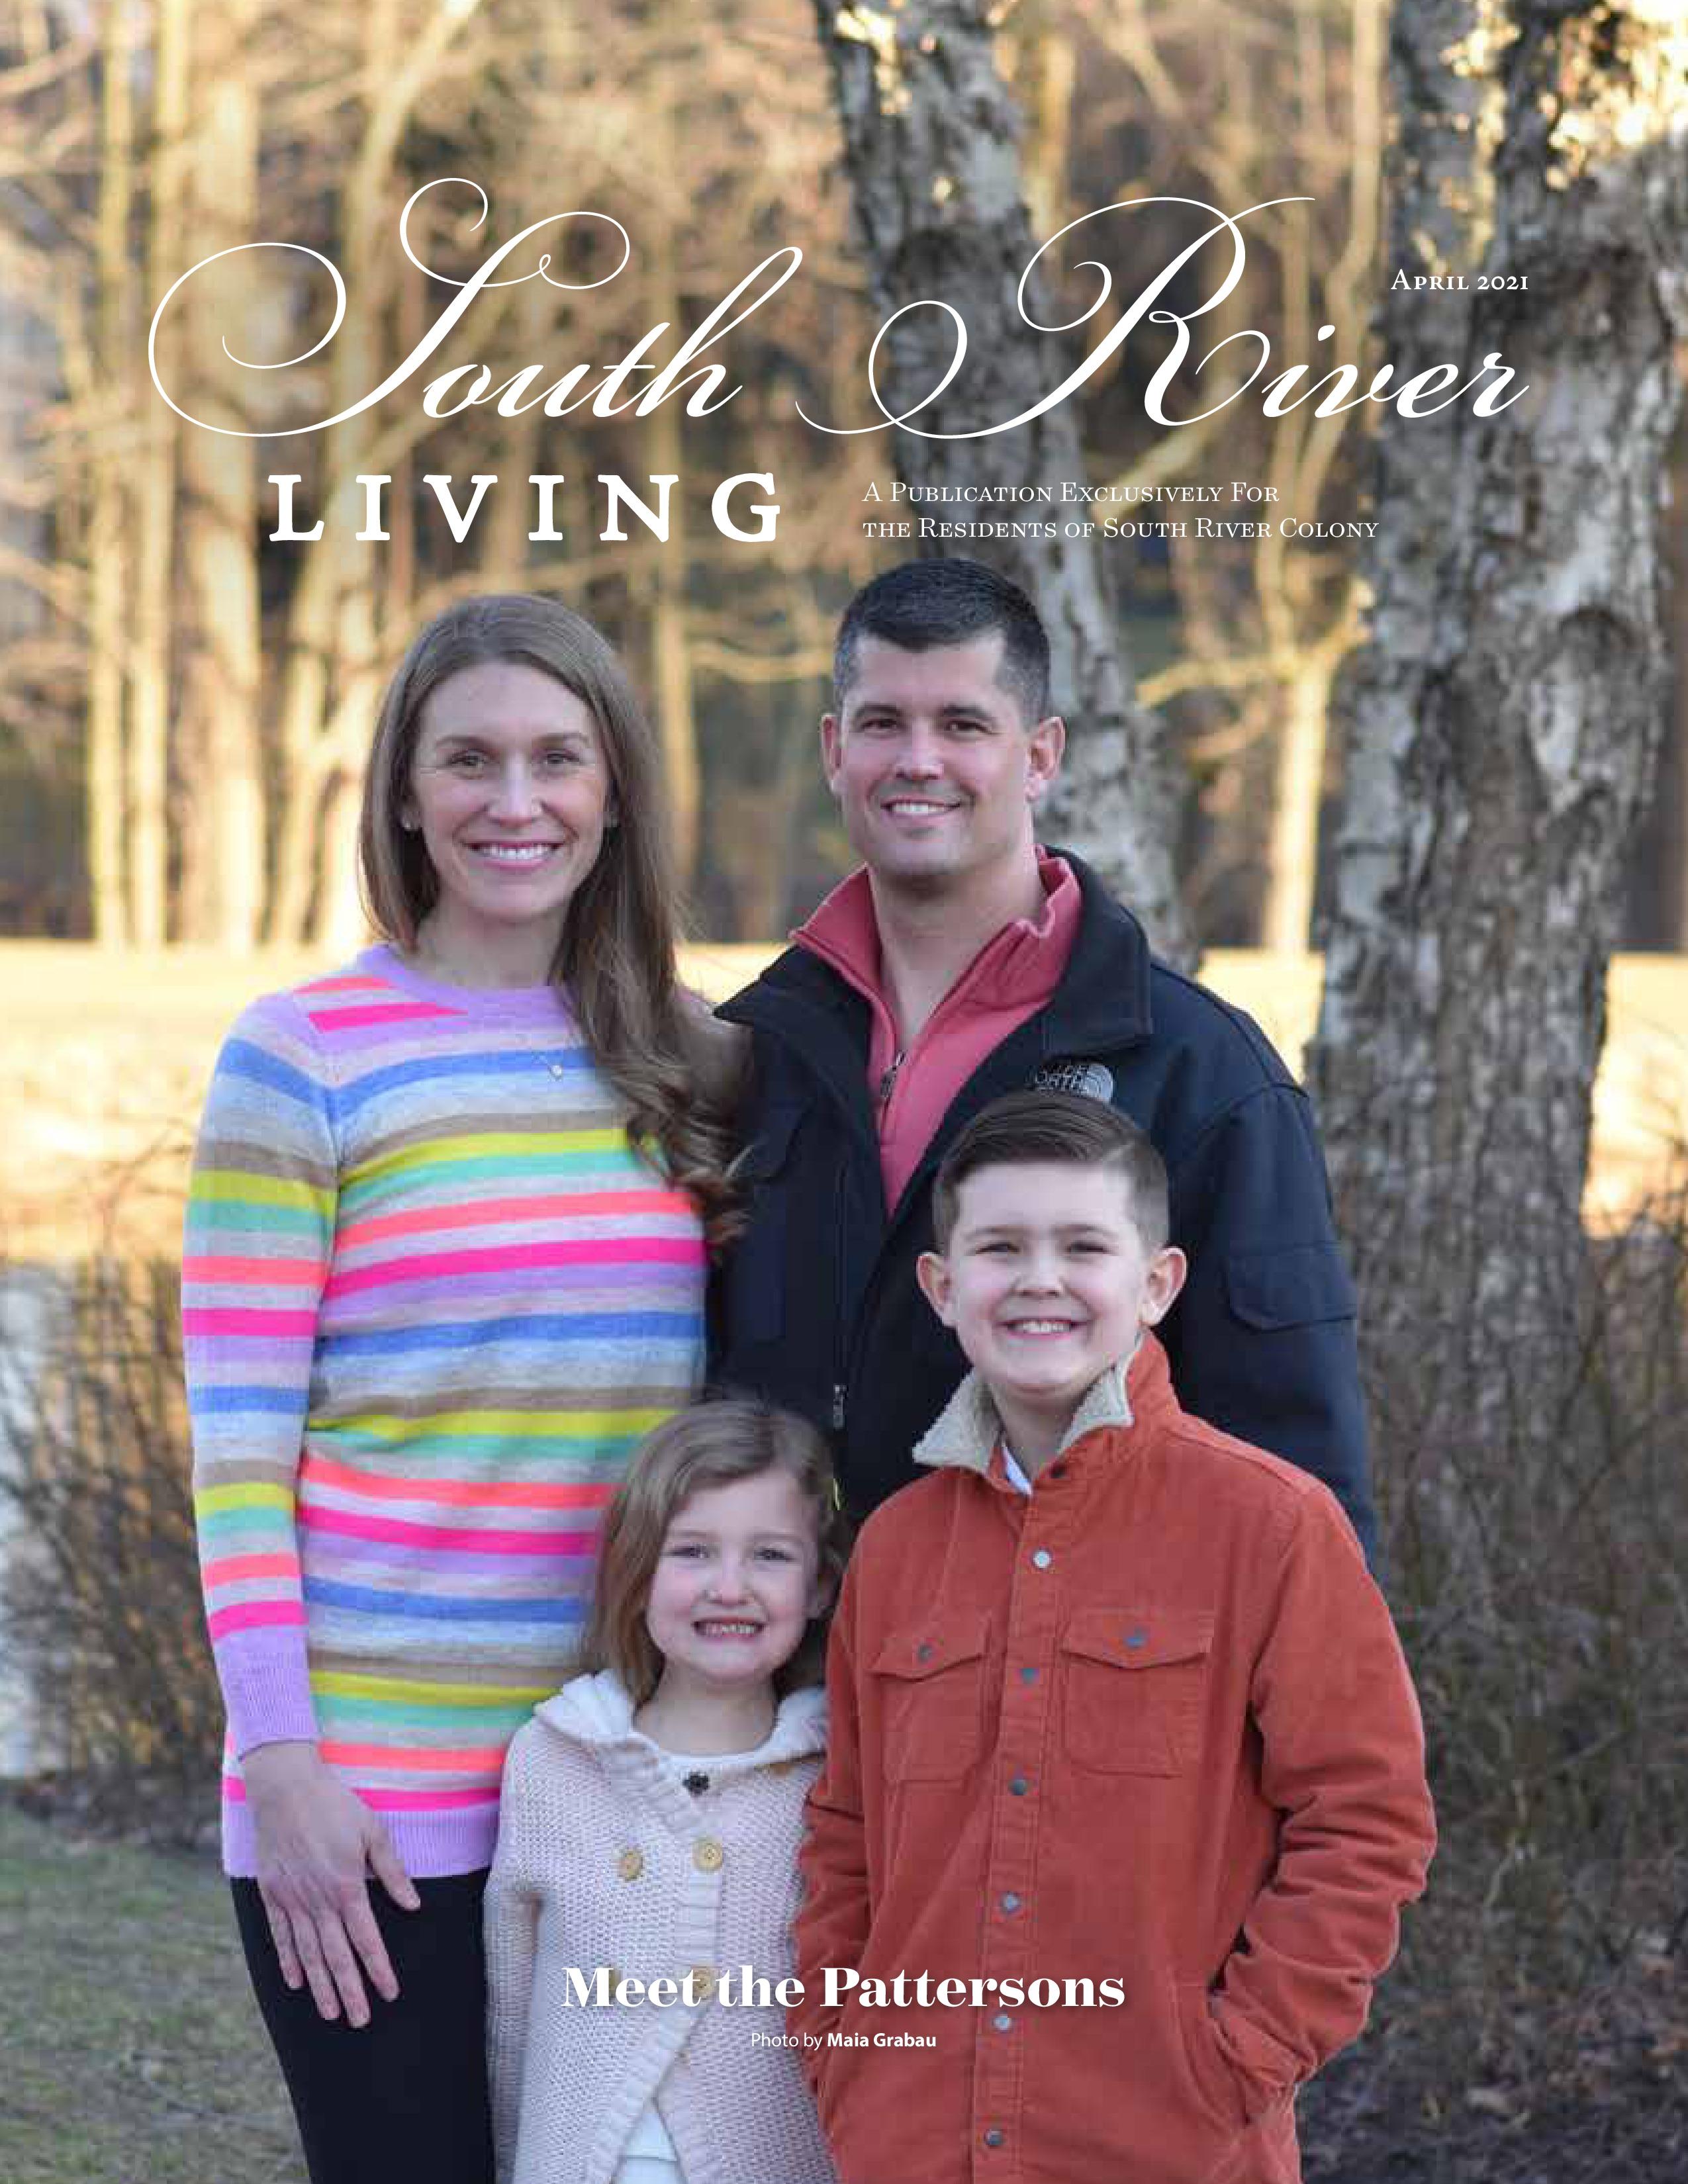 South River Living 2021-04-01